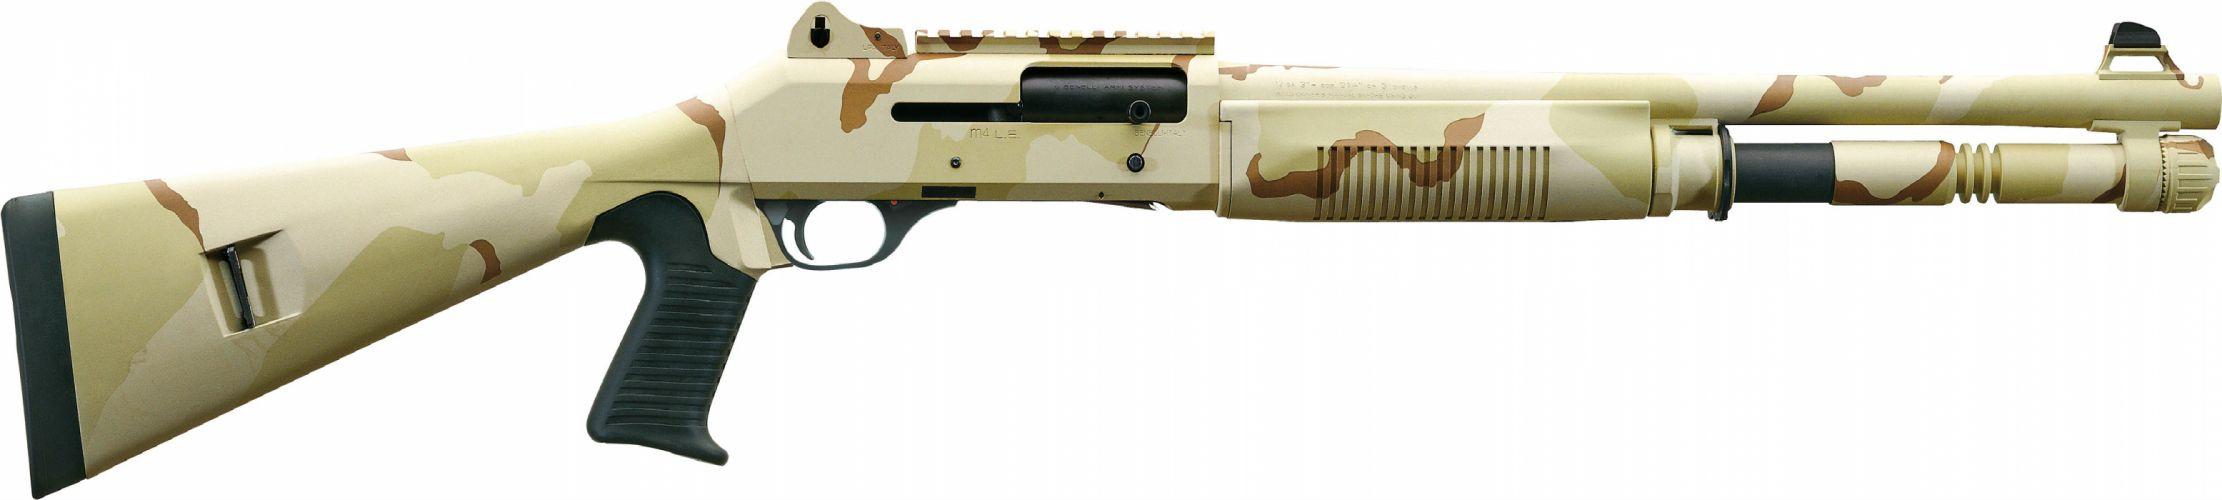 Benelli M-4 super90 weapon gun military shotgun te wallpaper